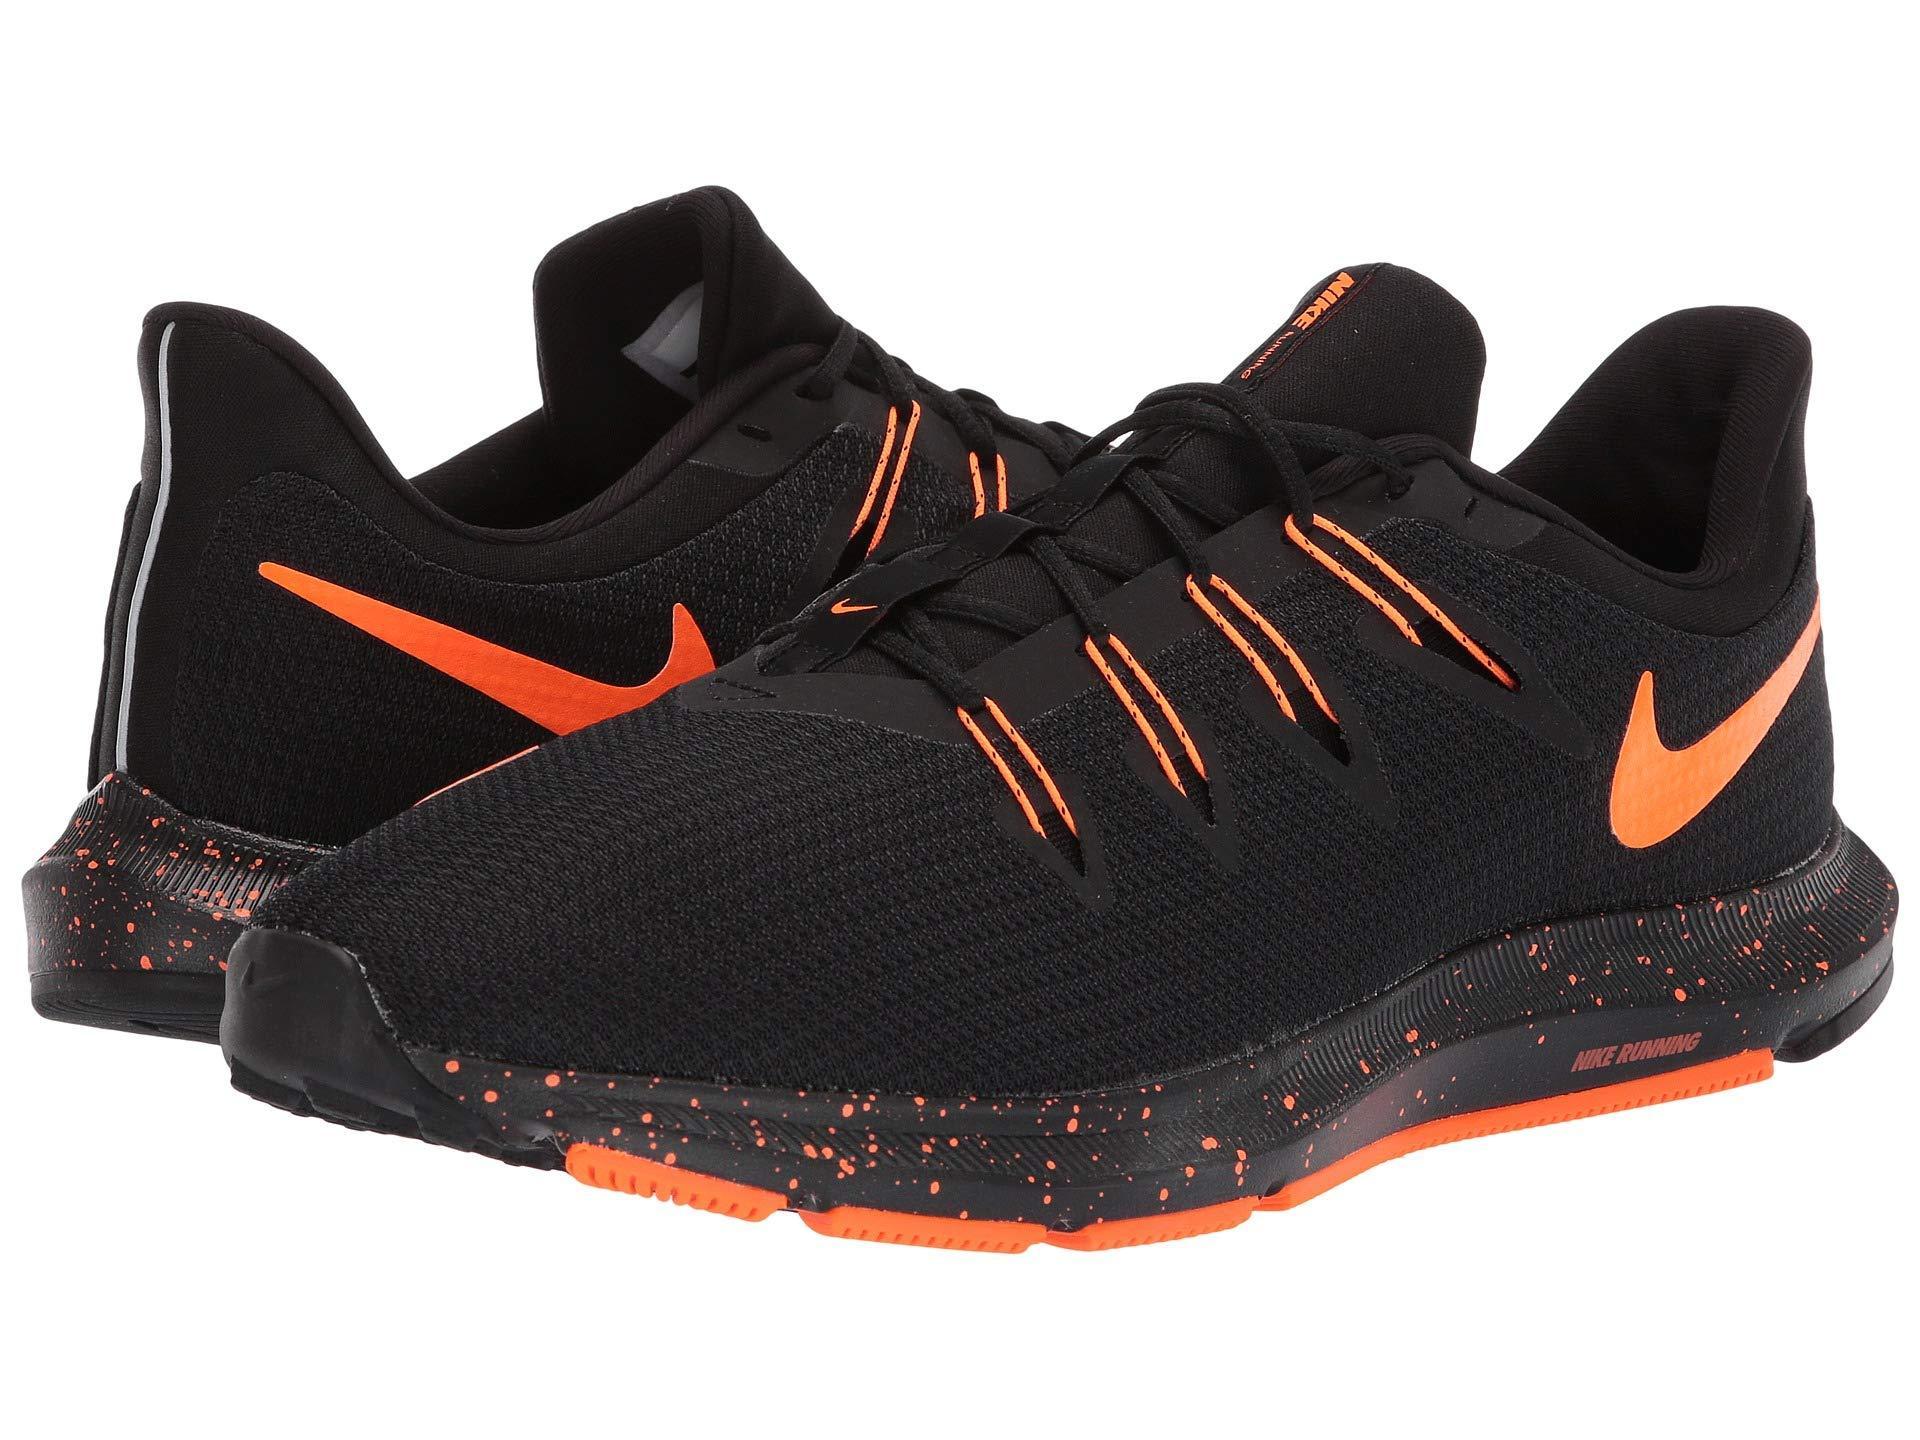 4e1f22a715310 Lyst - Nike Quest (black total Orange) Men s Running Shoes in Black ...